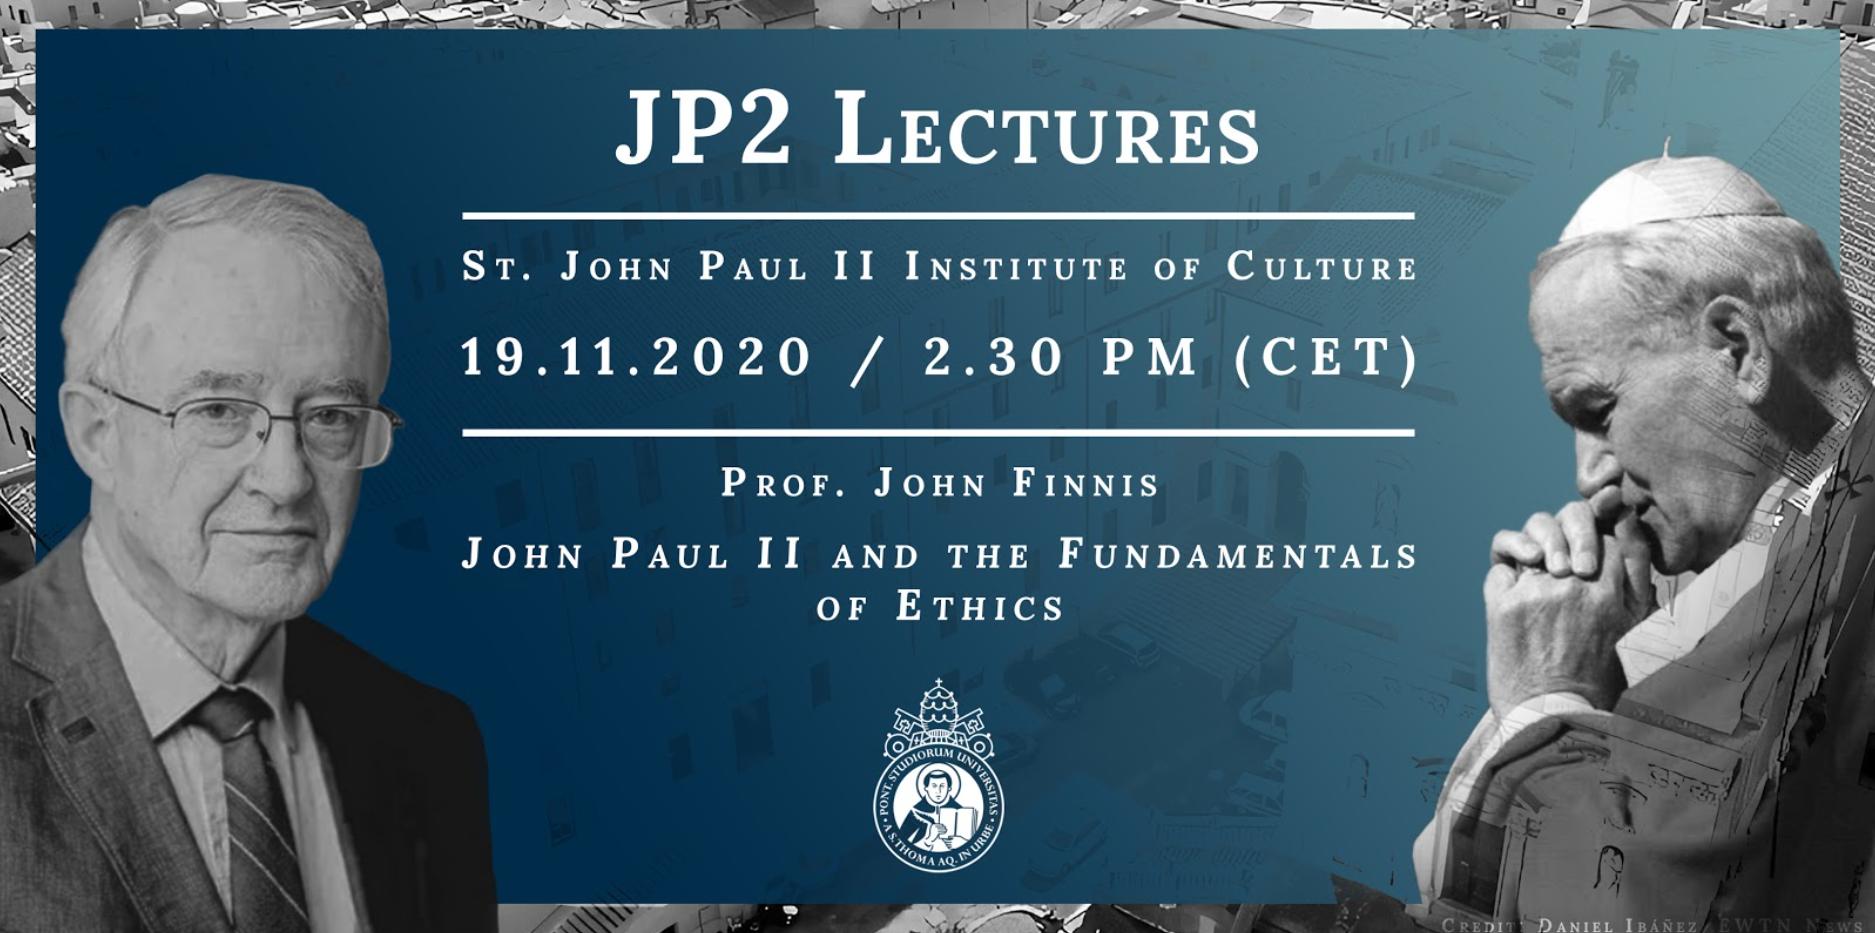 JP2 John Finnis Lecture